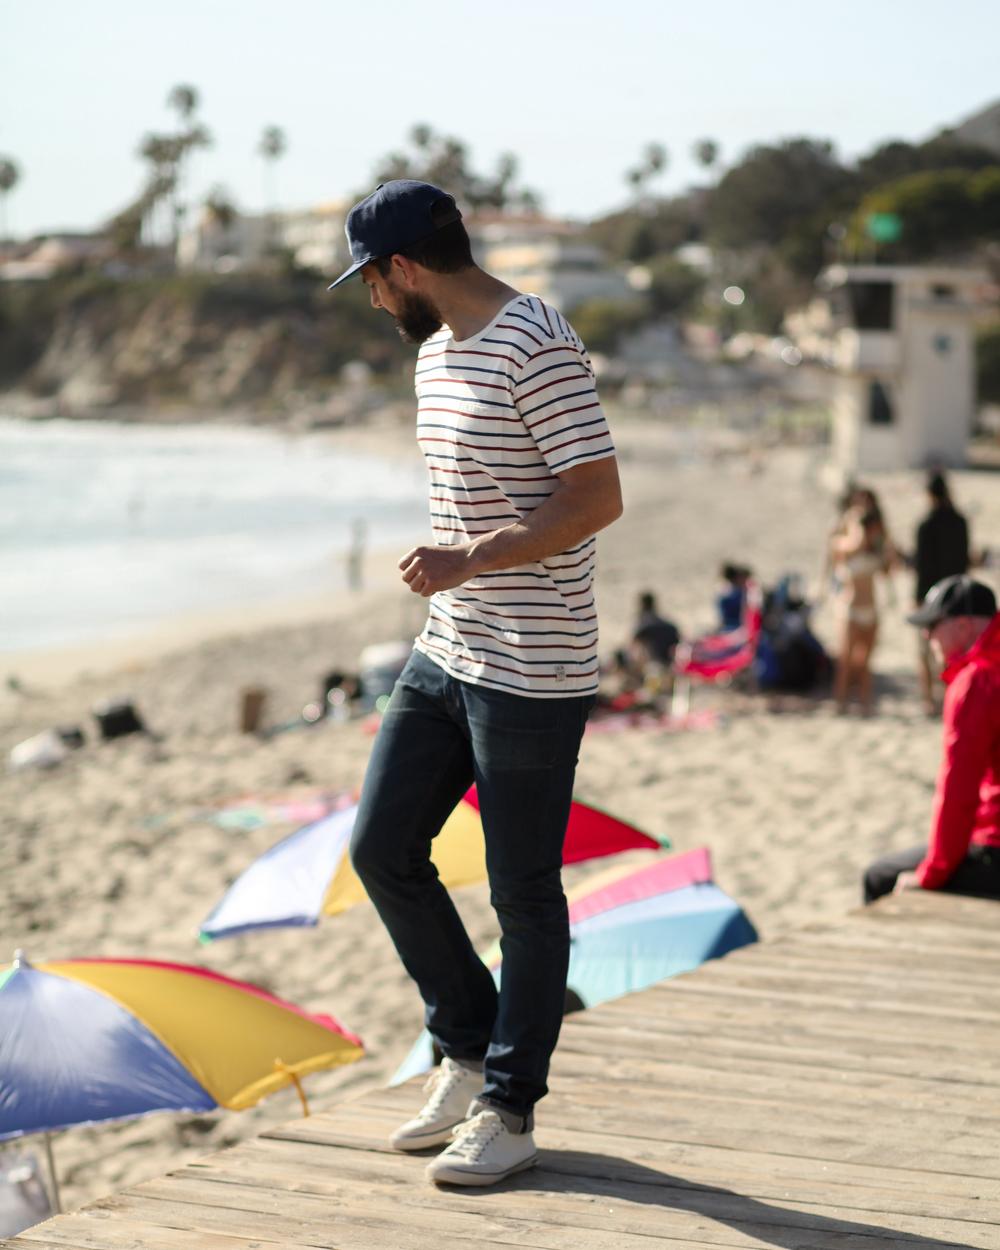 Ebbets Laguna Beach Ball Cap   Almond Westport Stripe Tee   Freenote Cloth 6 Month Wash Selvedge Denim   SeaVees Westwood Sneaker